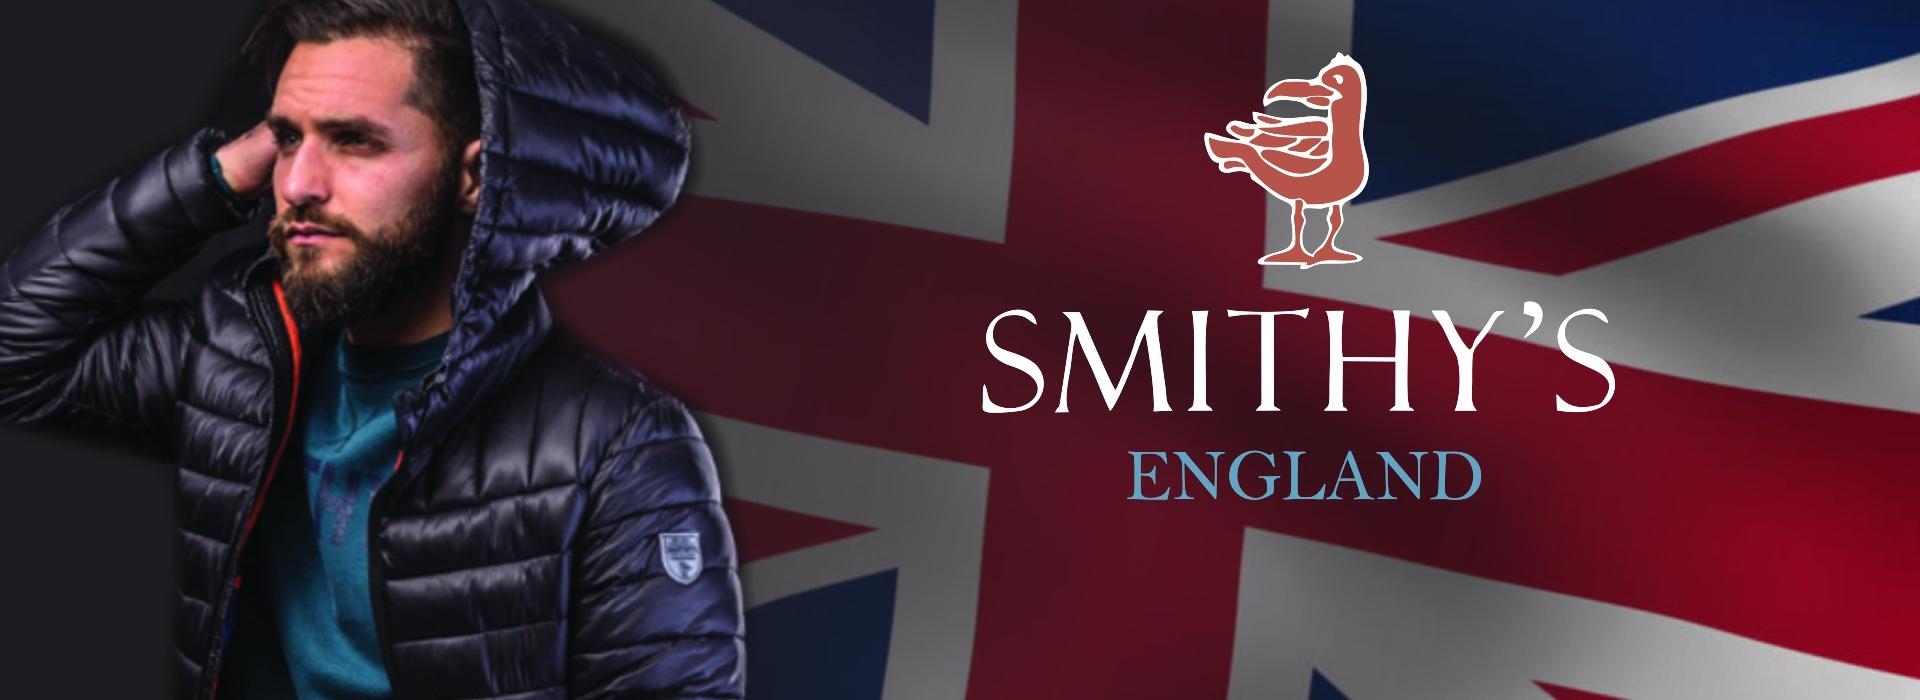 Smithy's England abbigliamento uomo